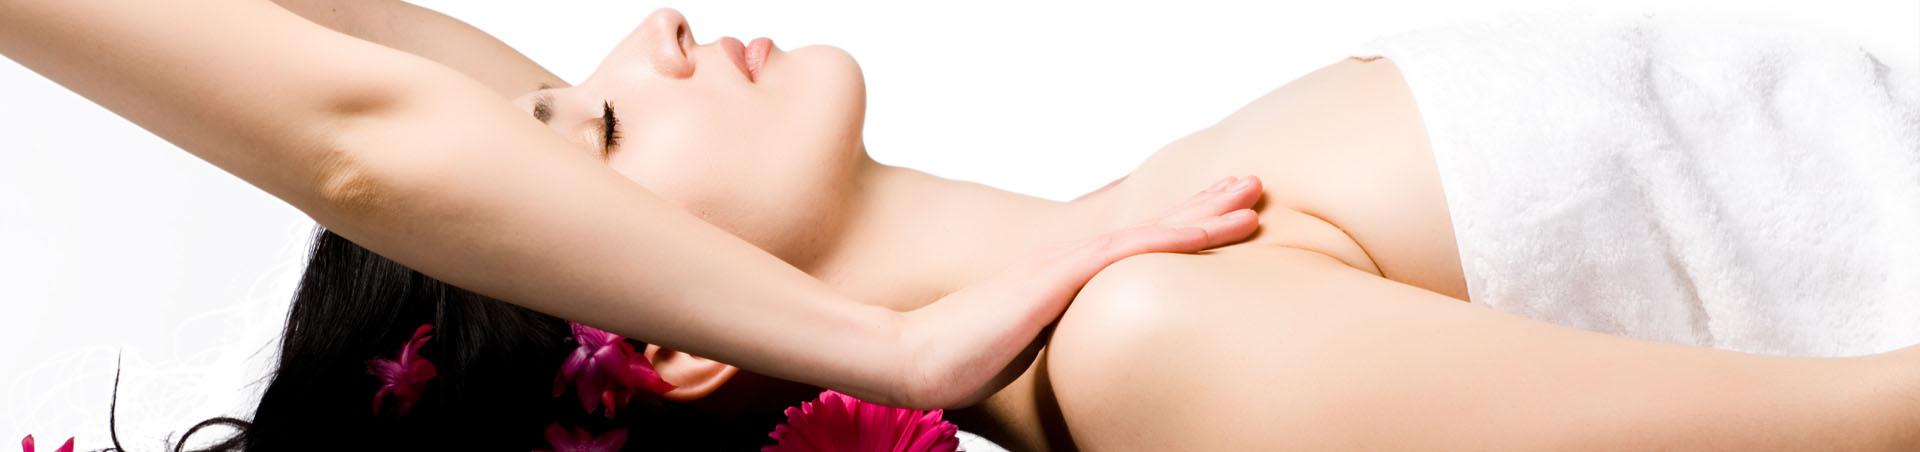 Facial Massage and Skincare